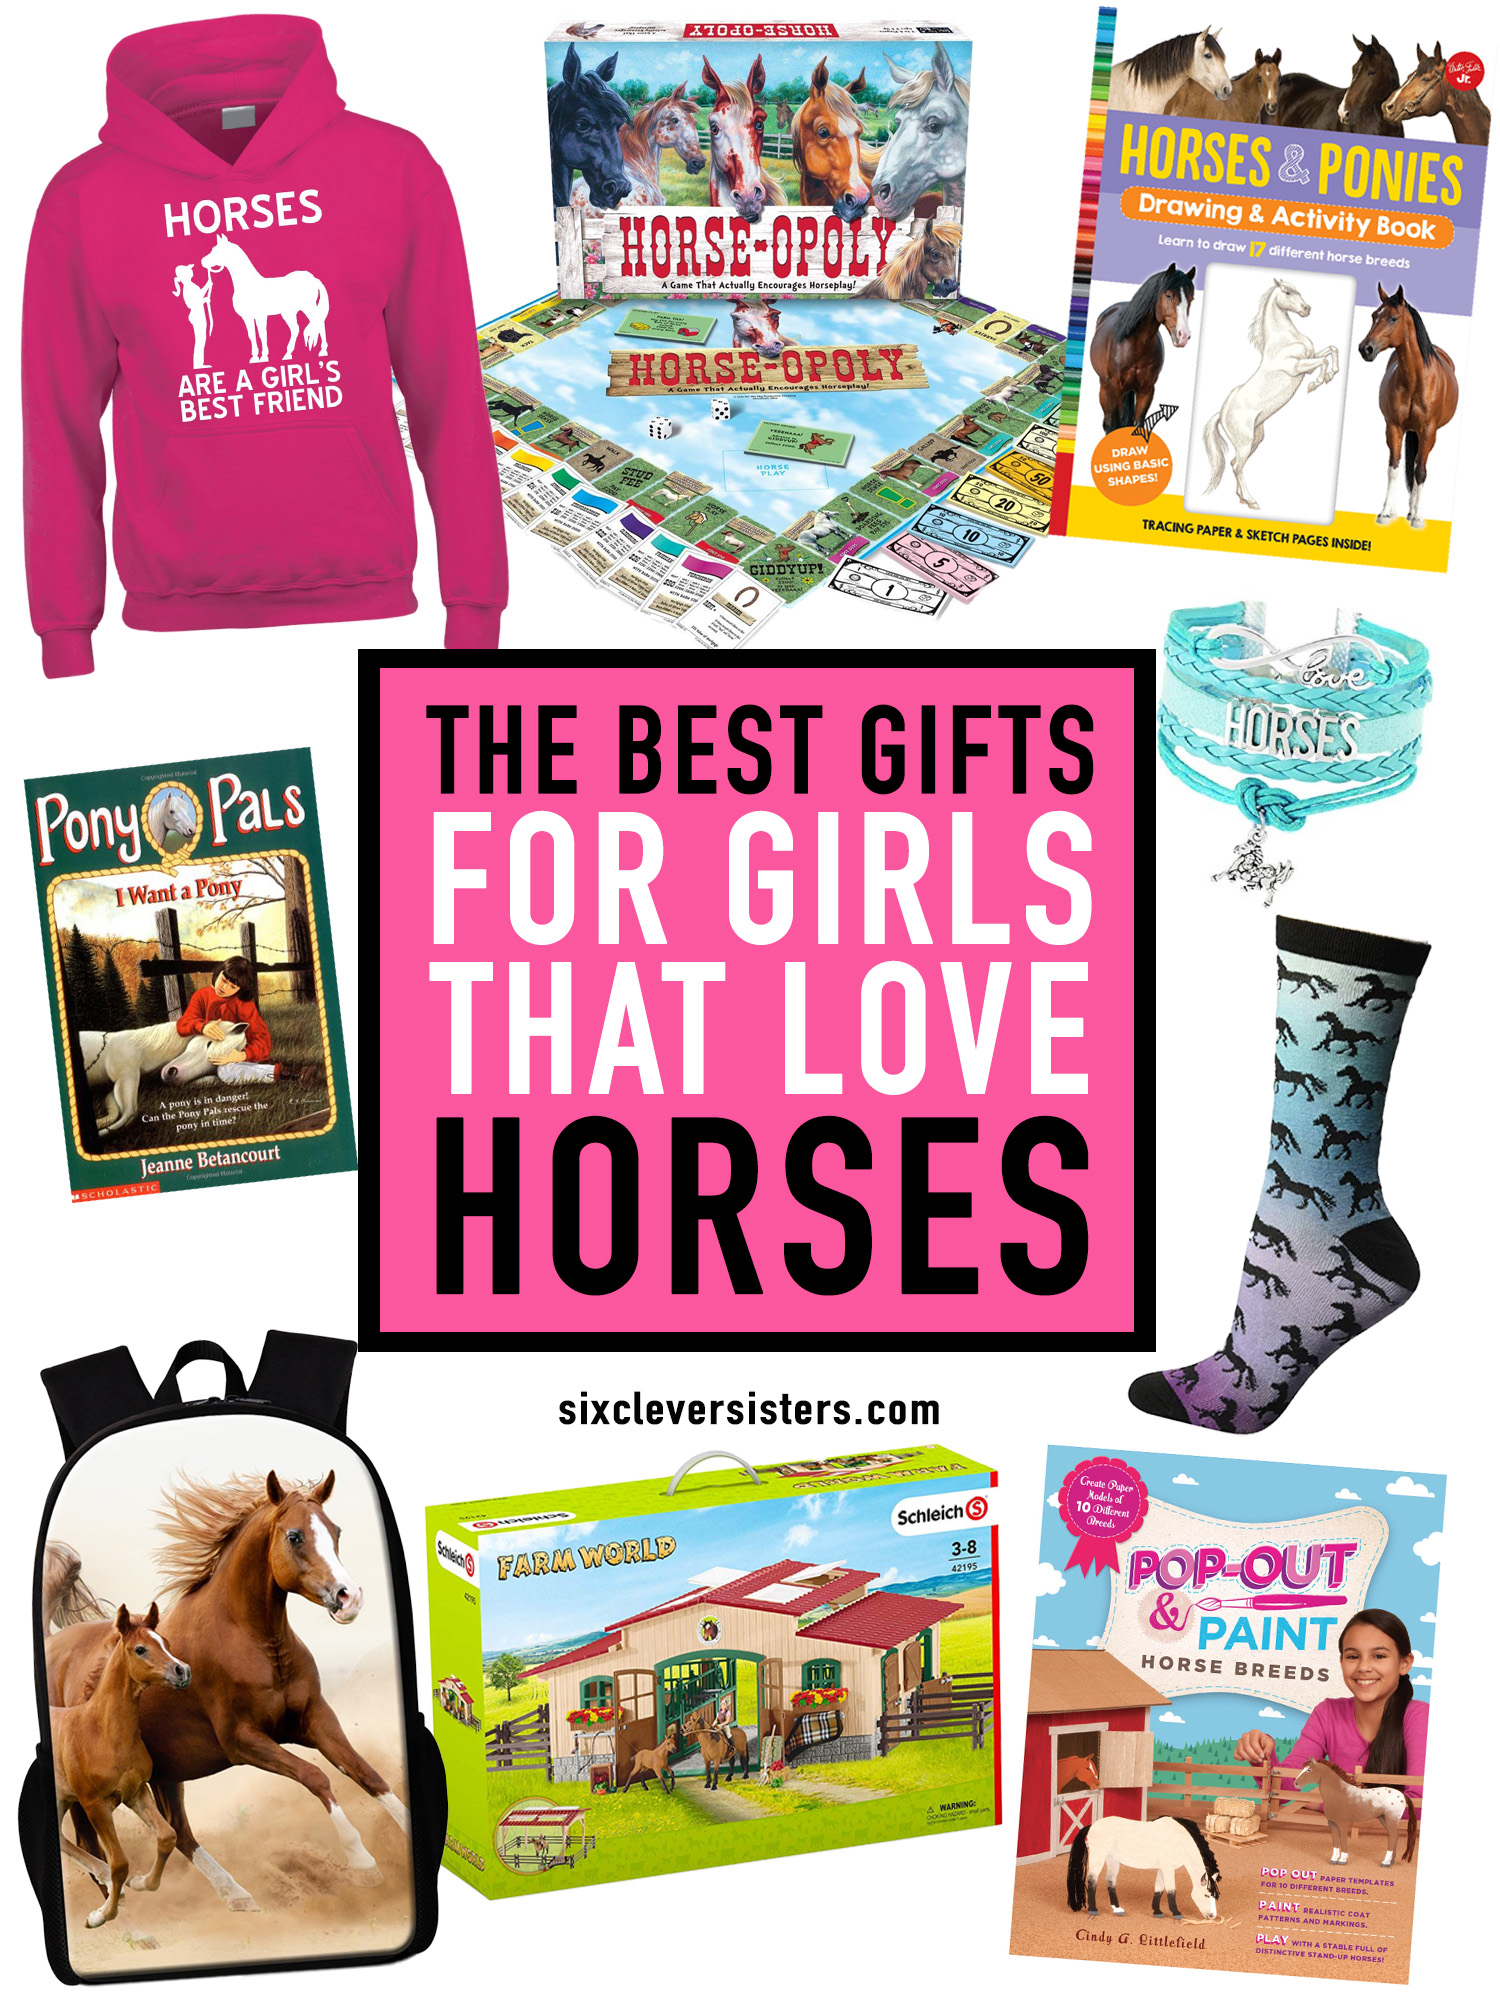 sackback gift for her present christmasgift horse, backpack Horse print rucksack backpack kids backpack